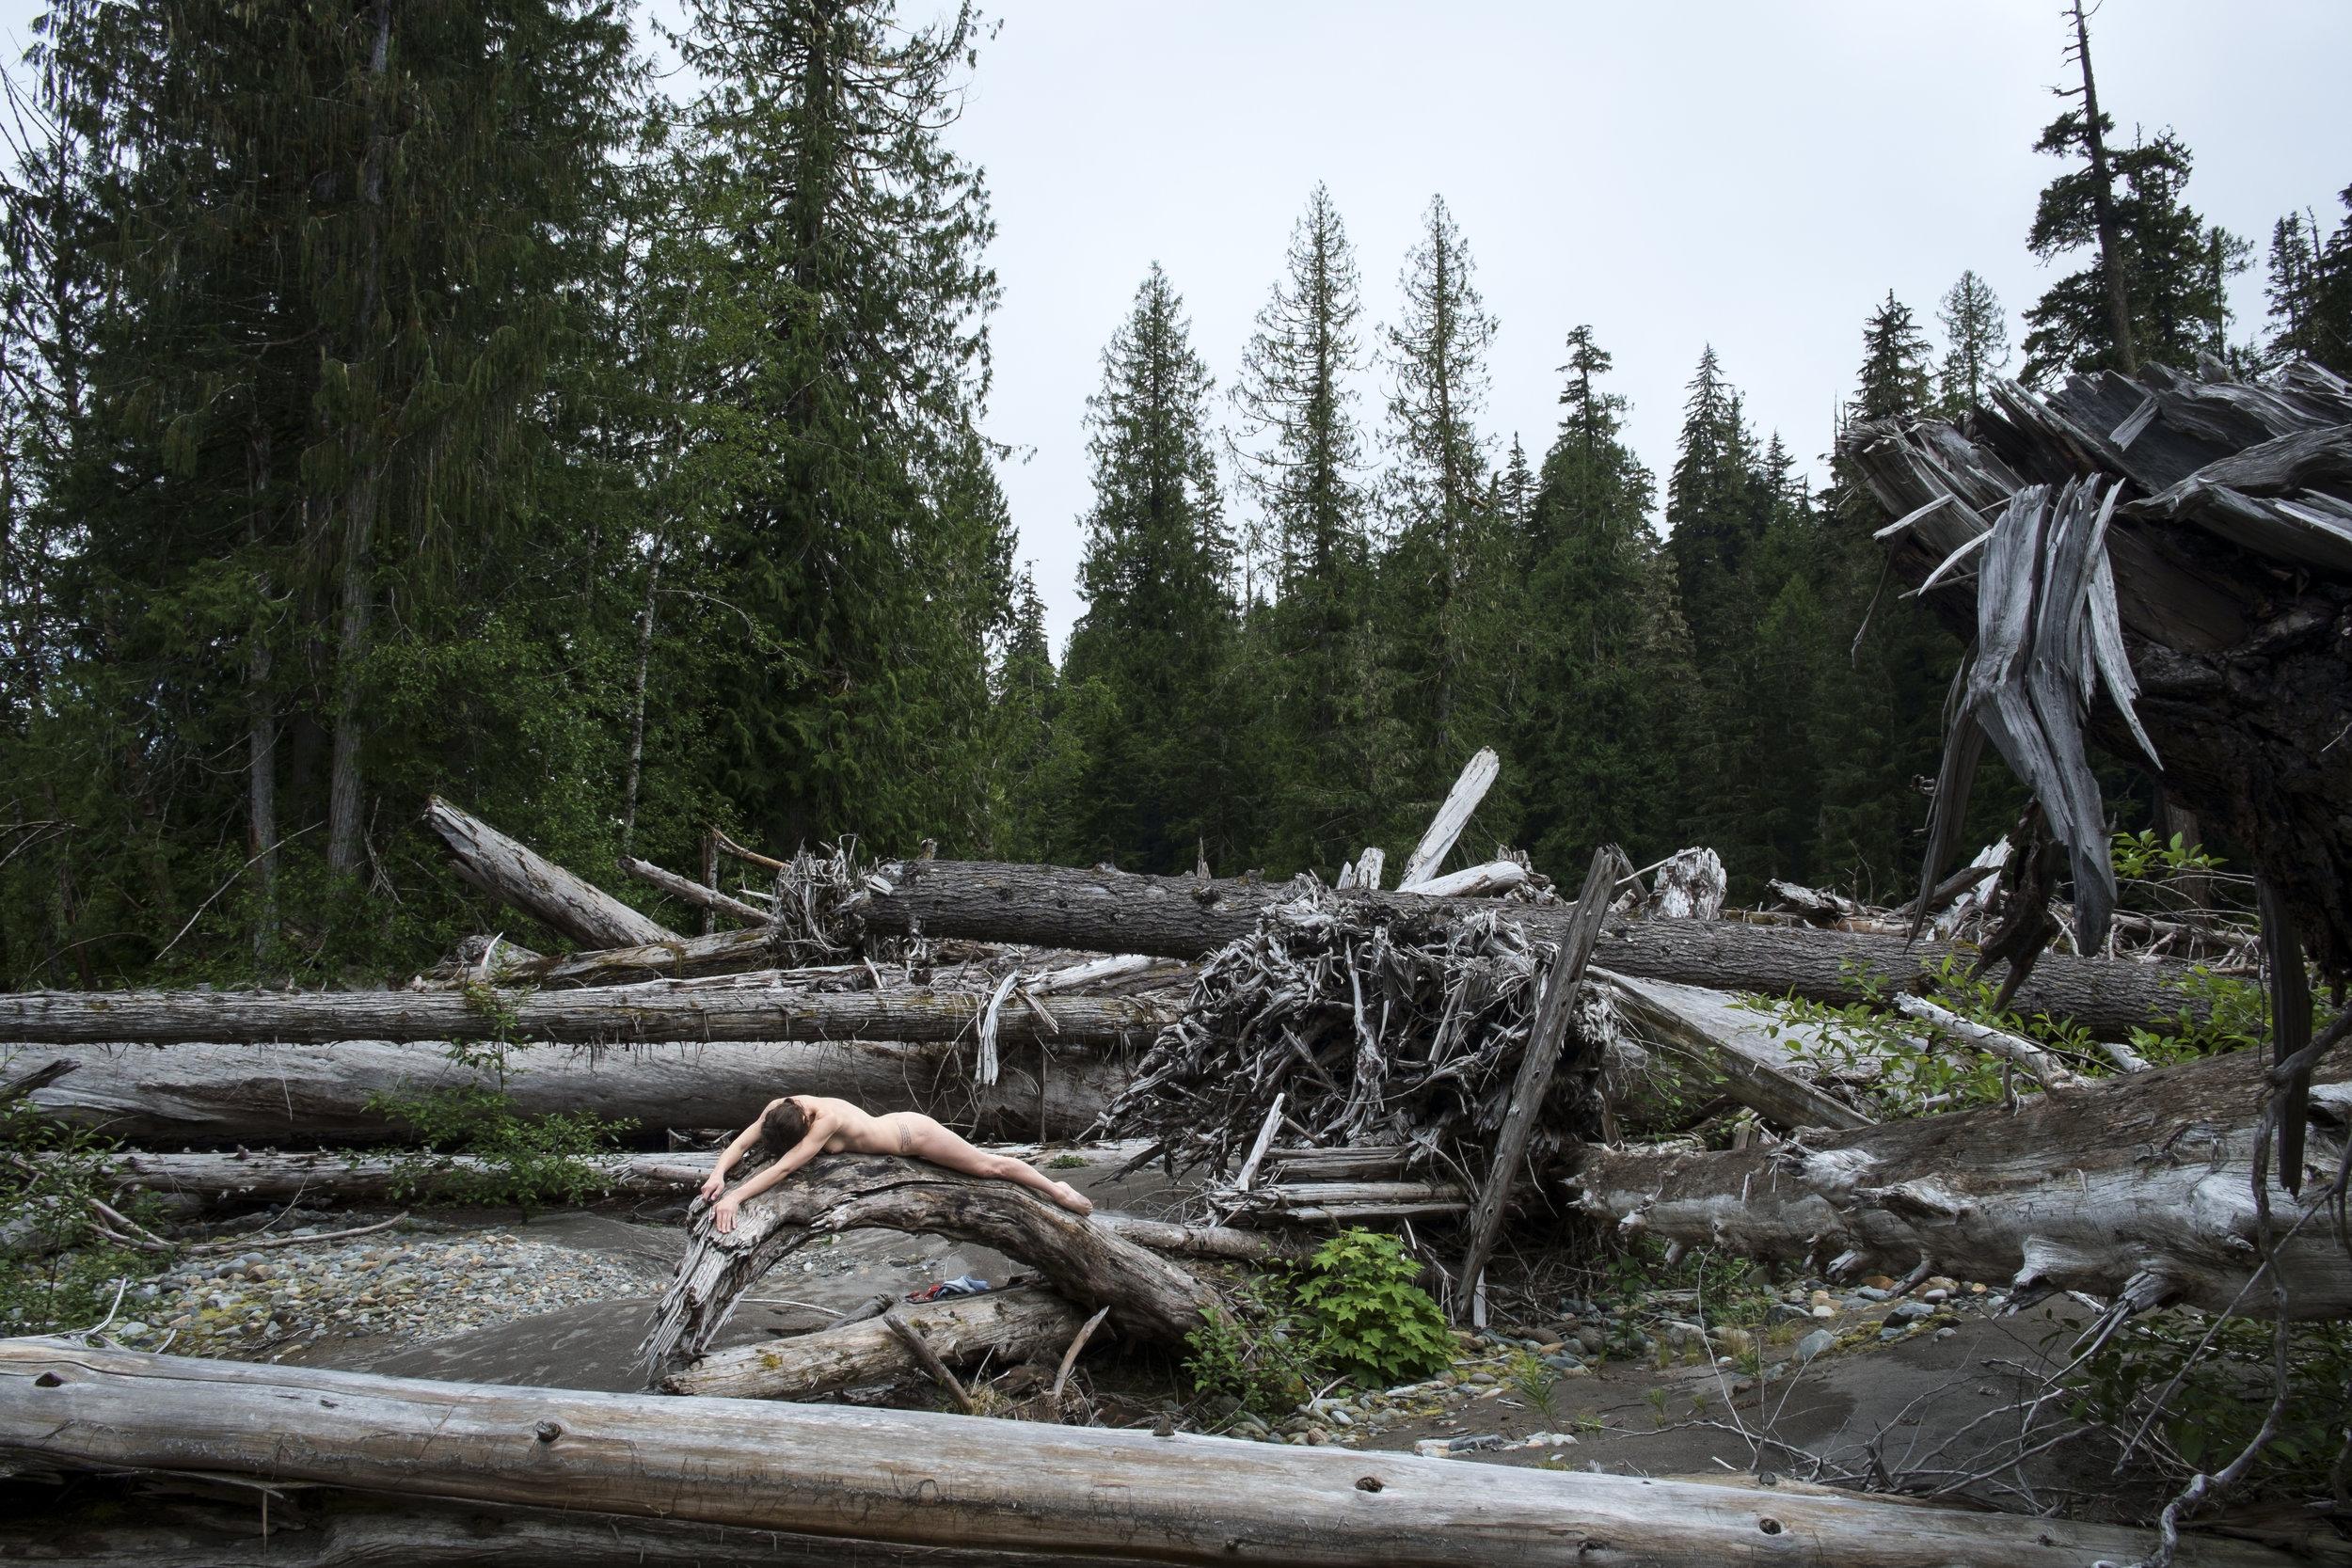 Mount Rainier National Park (2015)